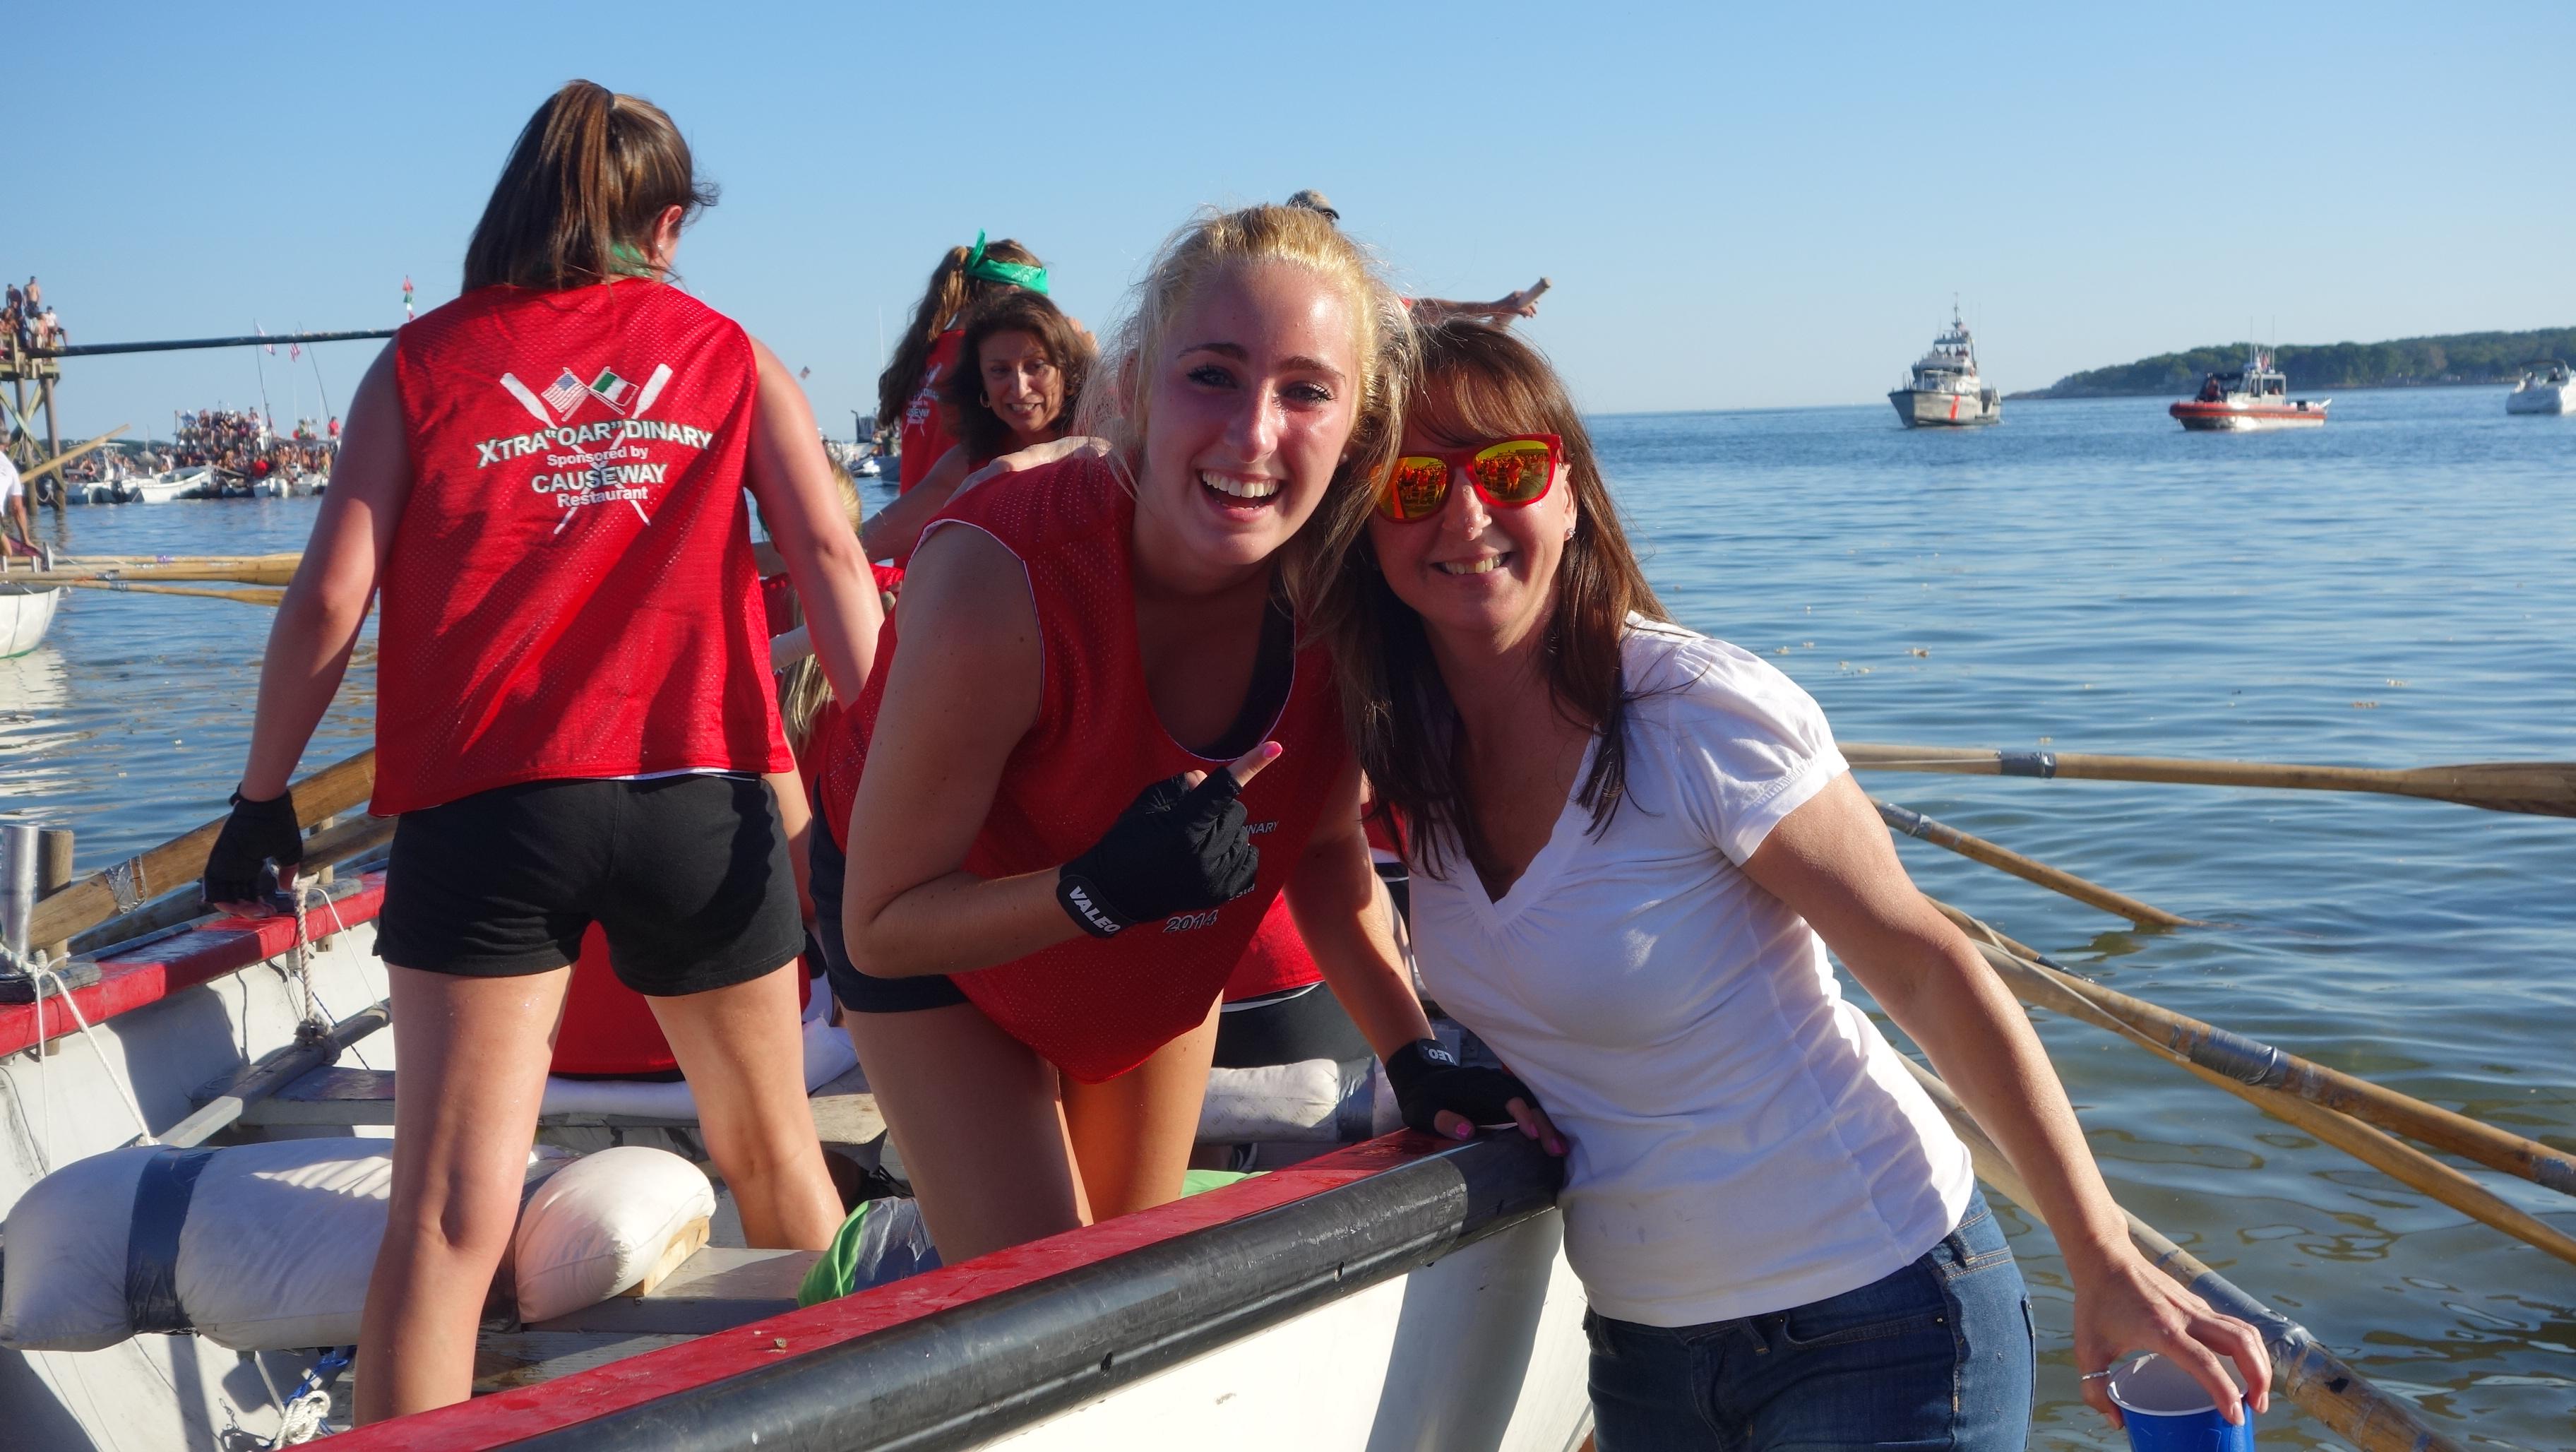 Amanda Race St. Peter's Fiesta 2014 Camps! 237